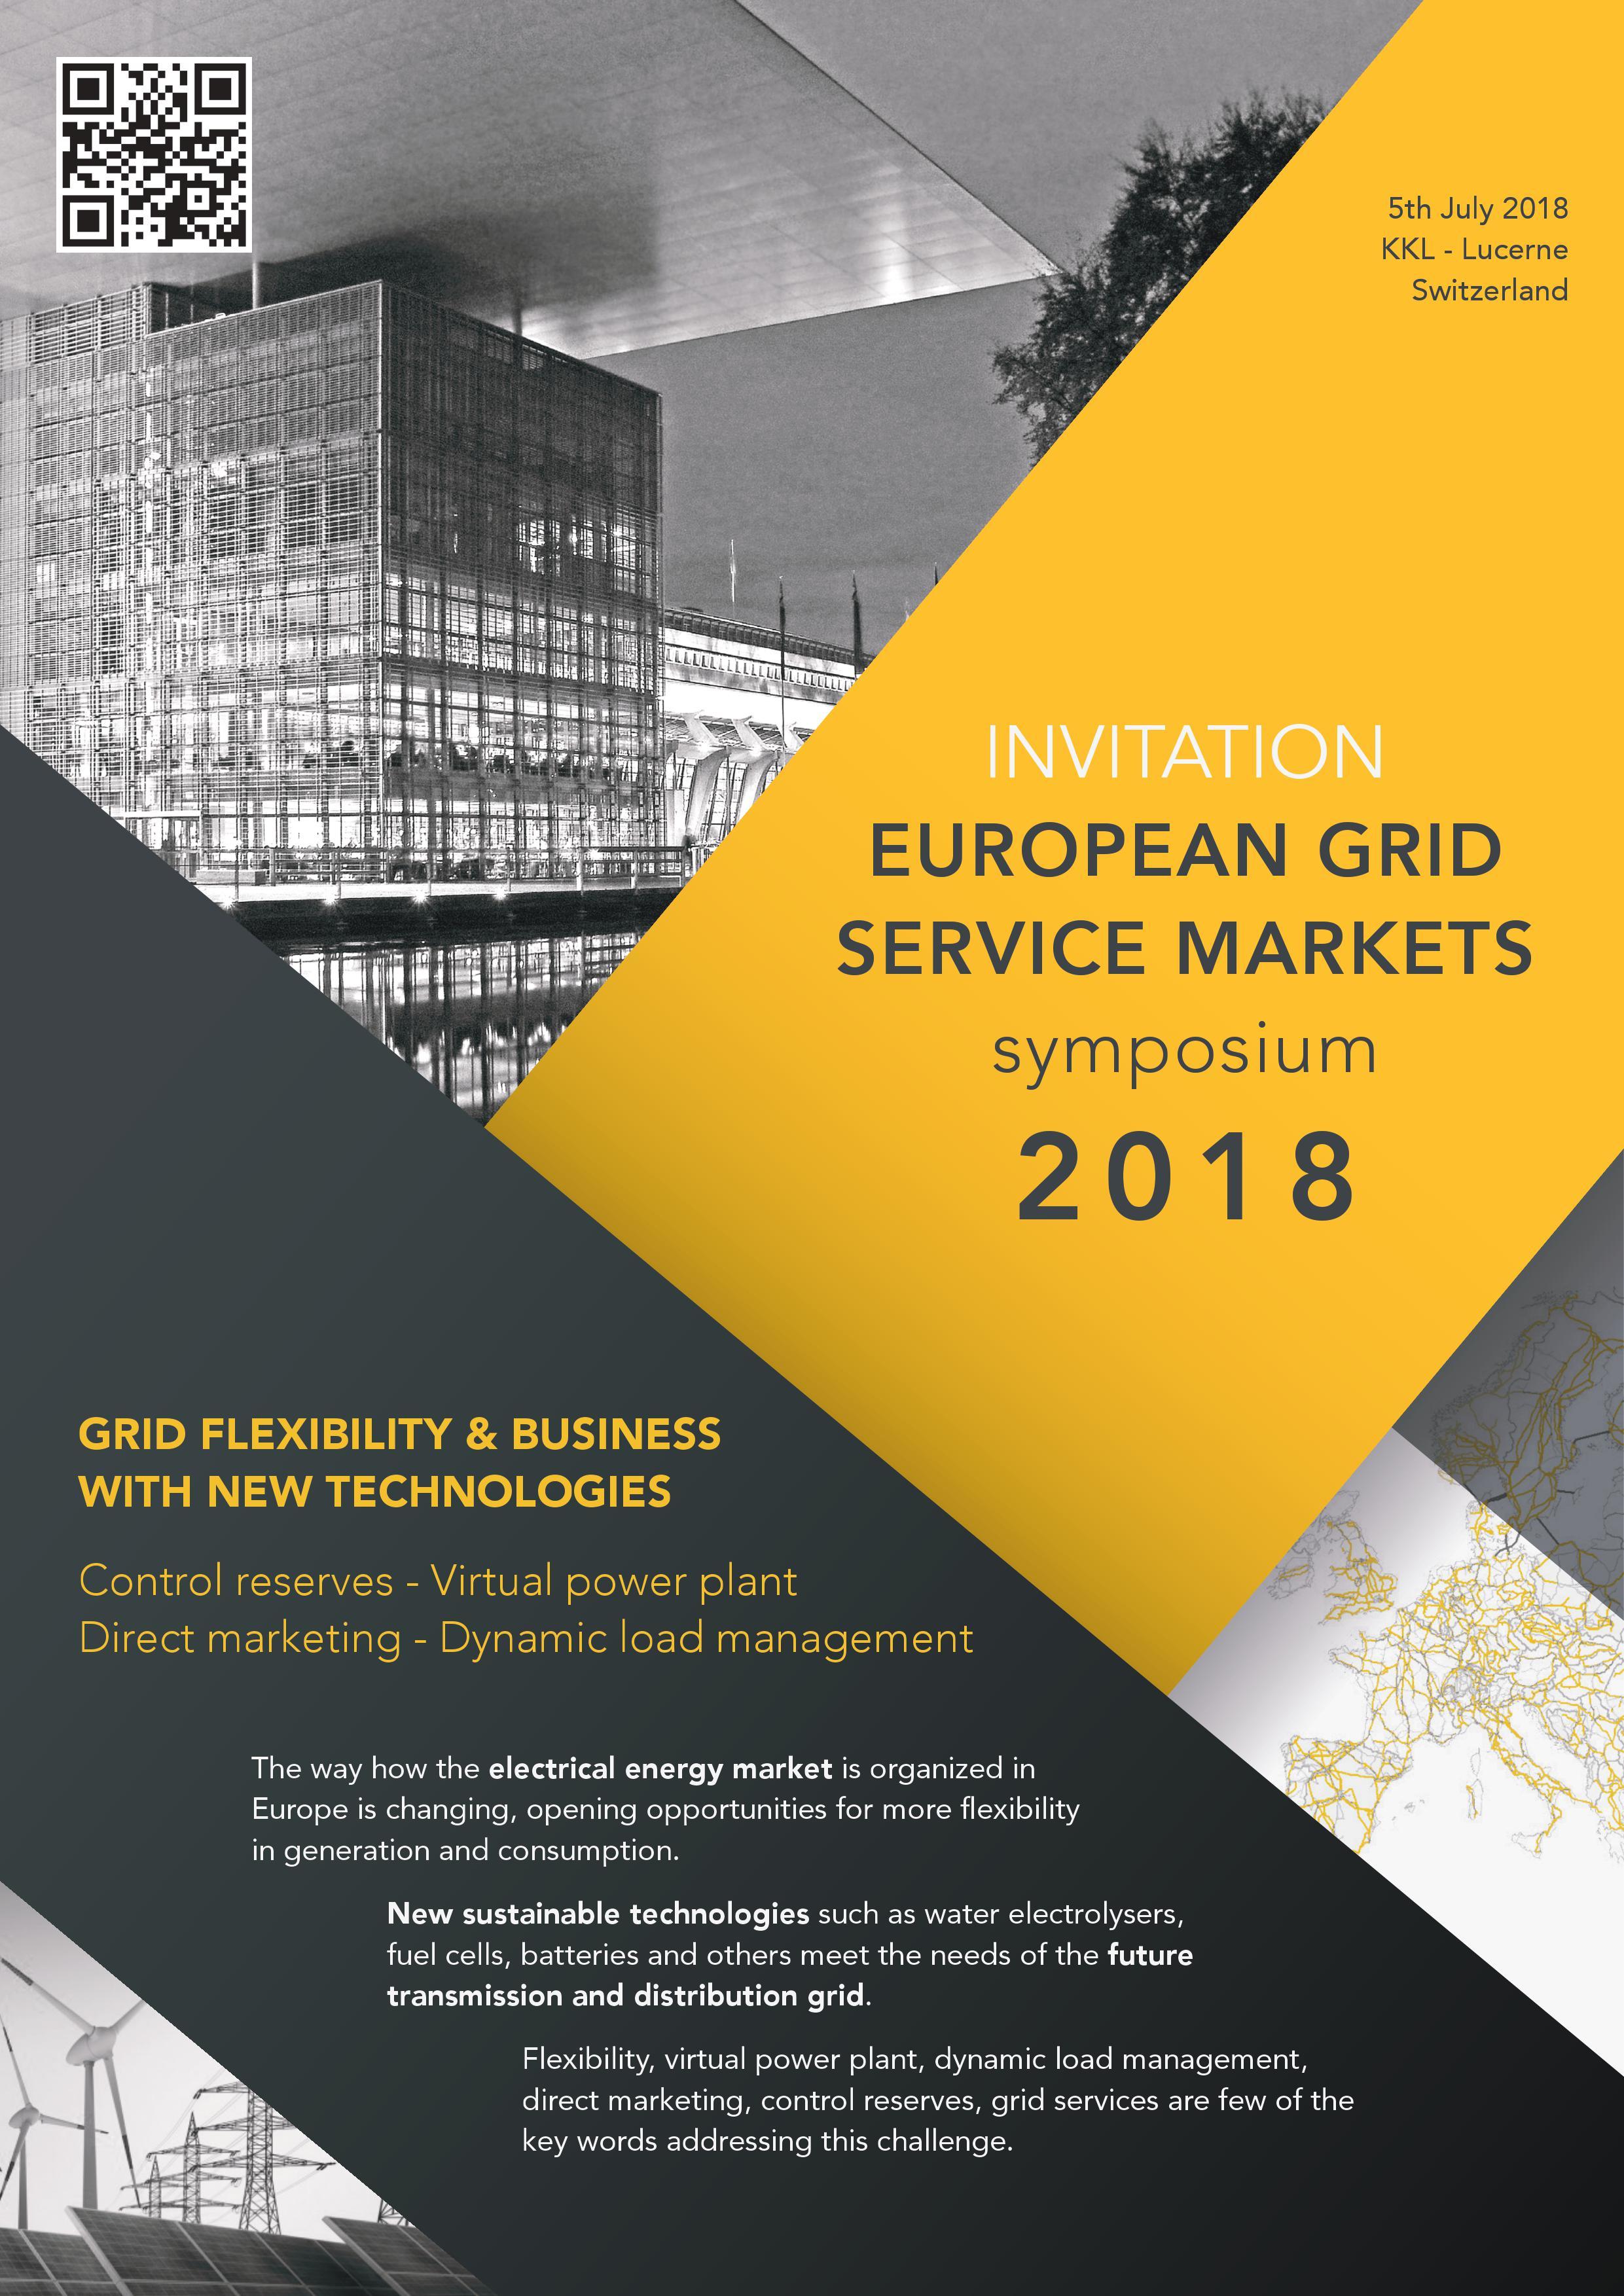 Invitation Programme Details European Grid Service Markets Symposium